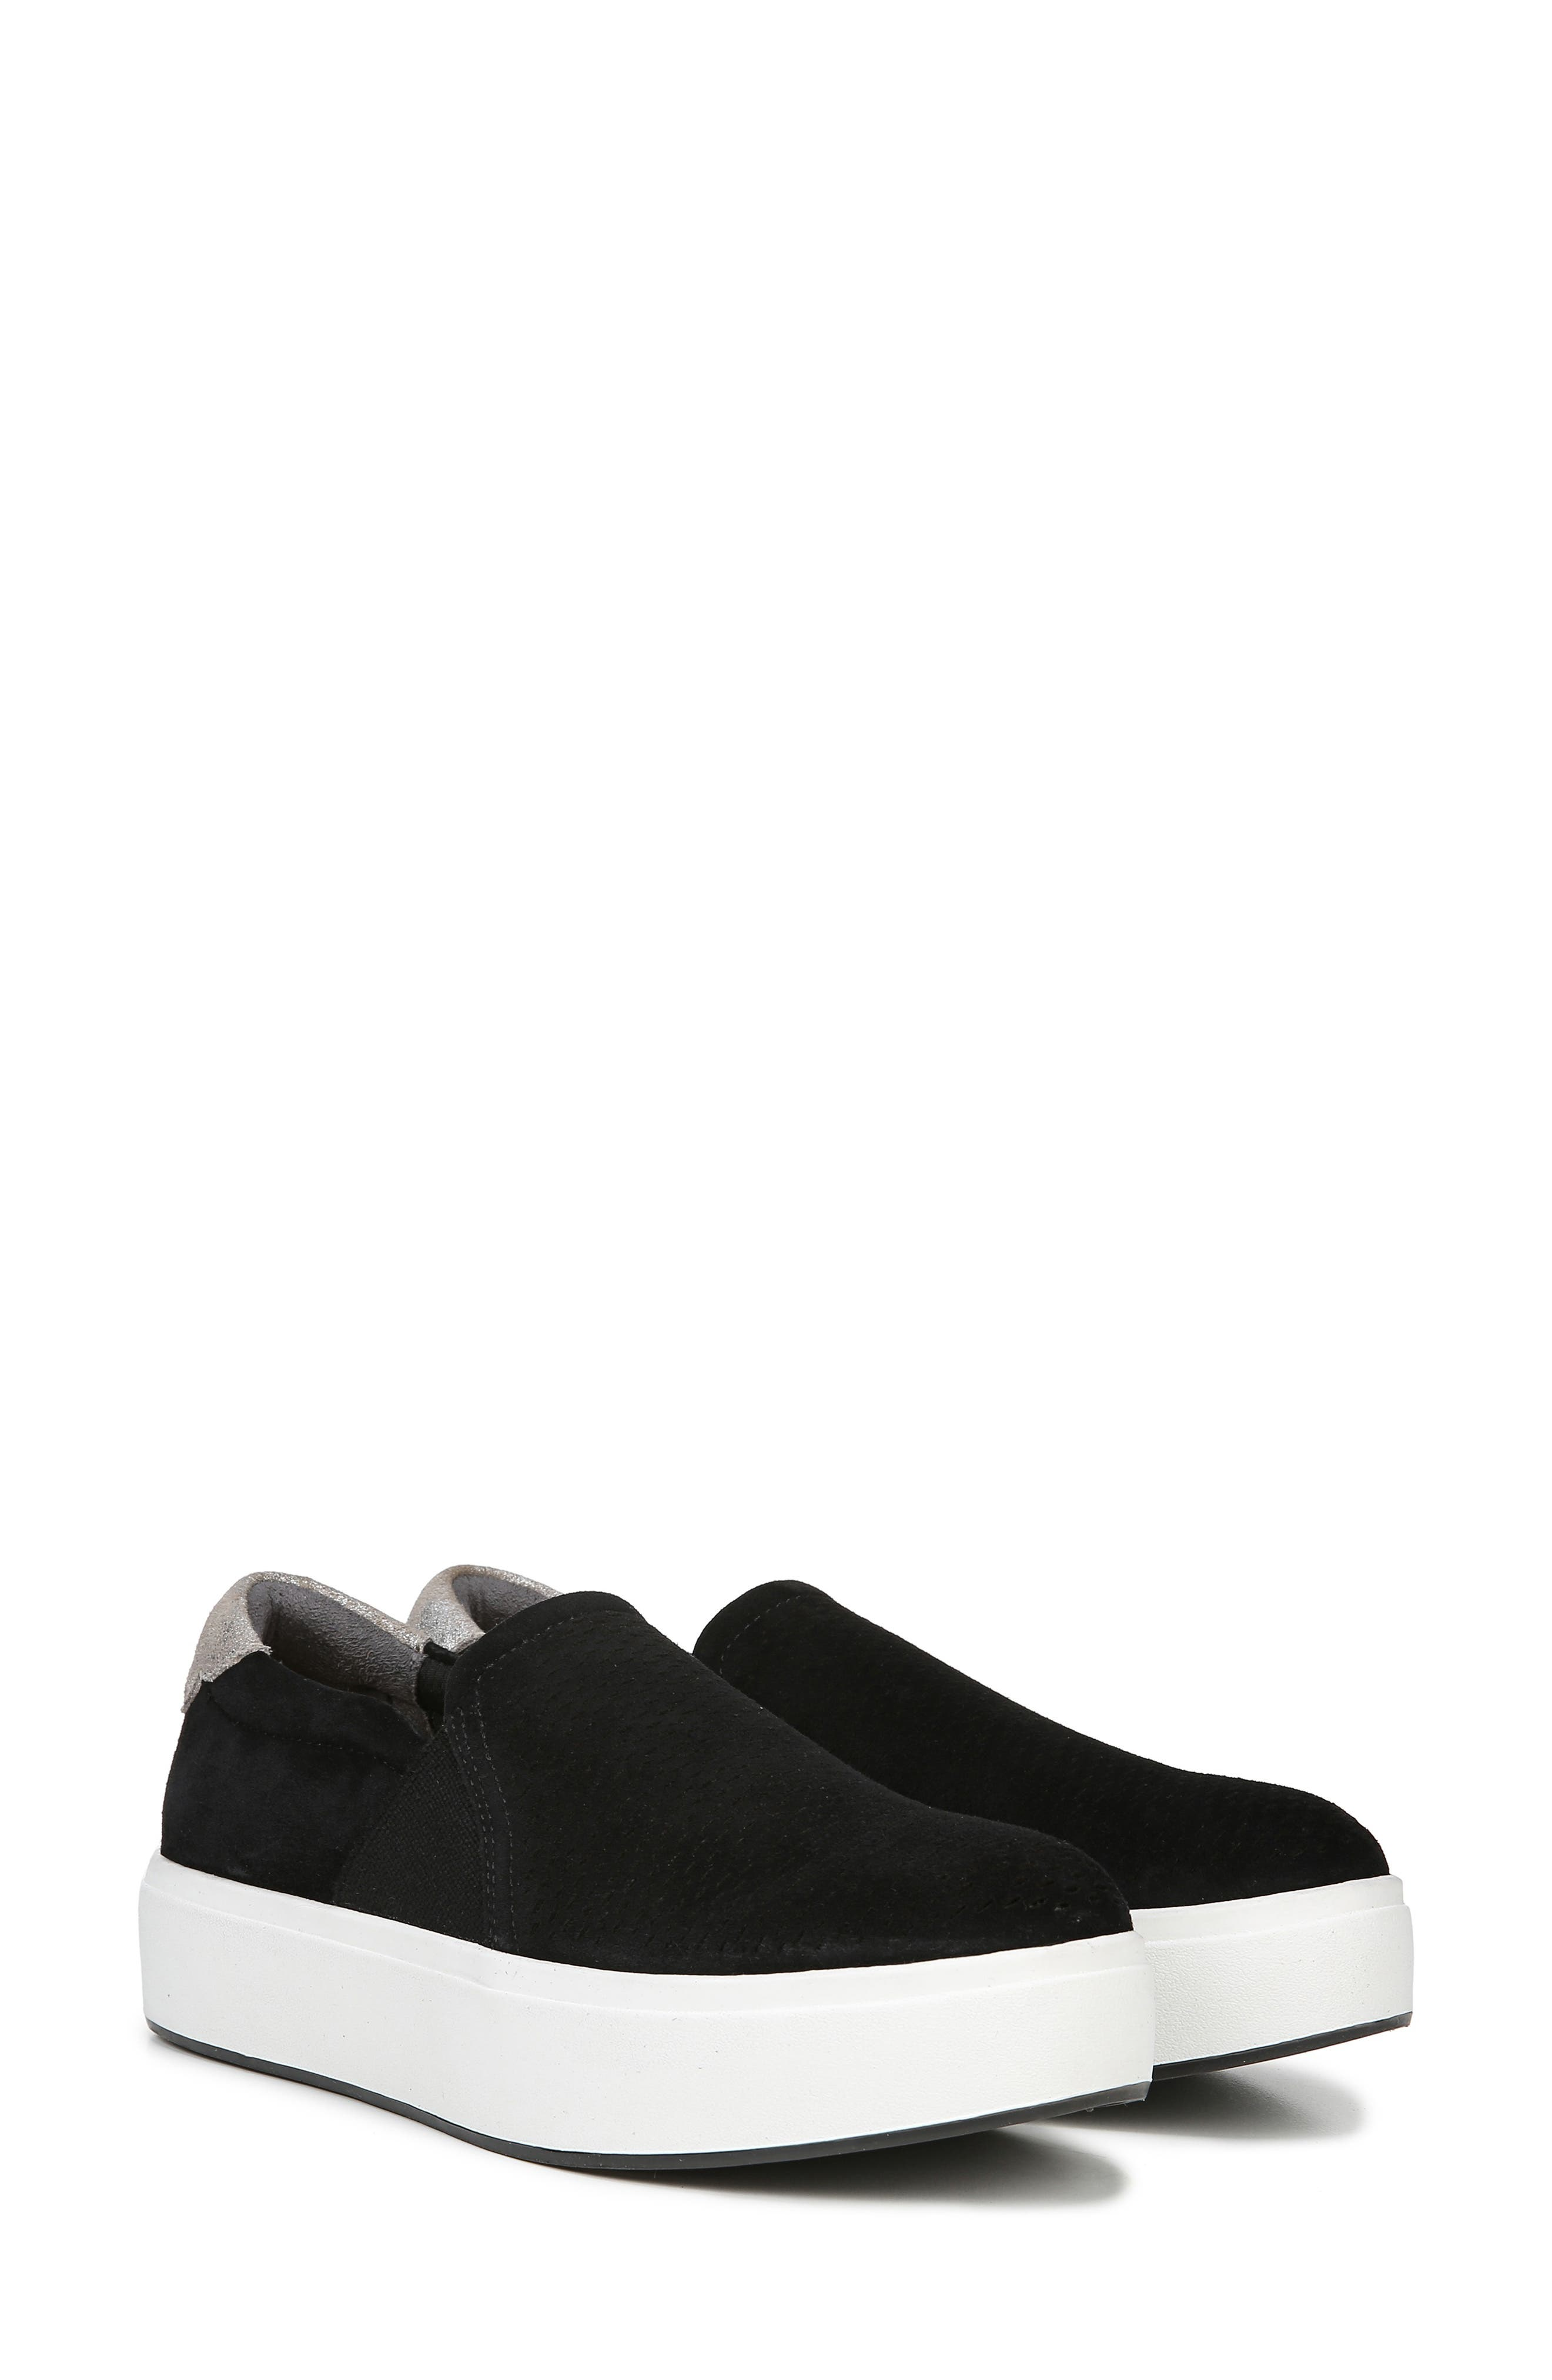 DR. SCHOLL'S, Abbot Lux Sneaker, Alternate thumbnail 9, color, BLACK SUEDE